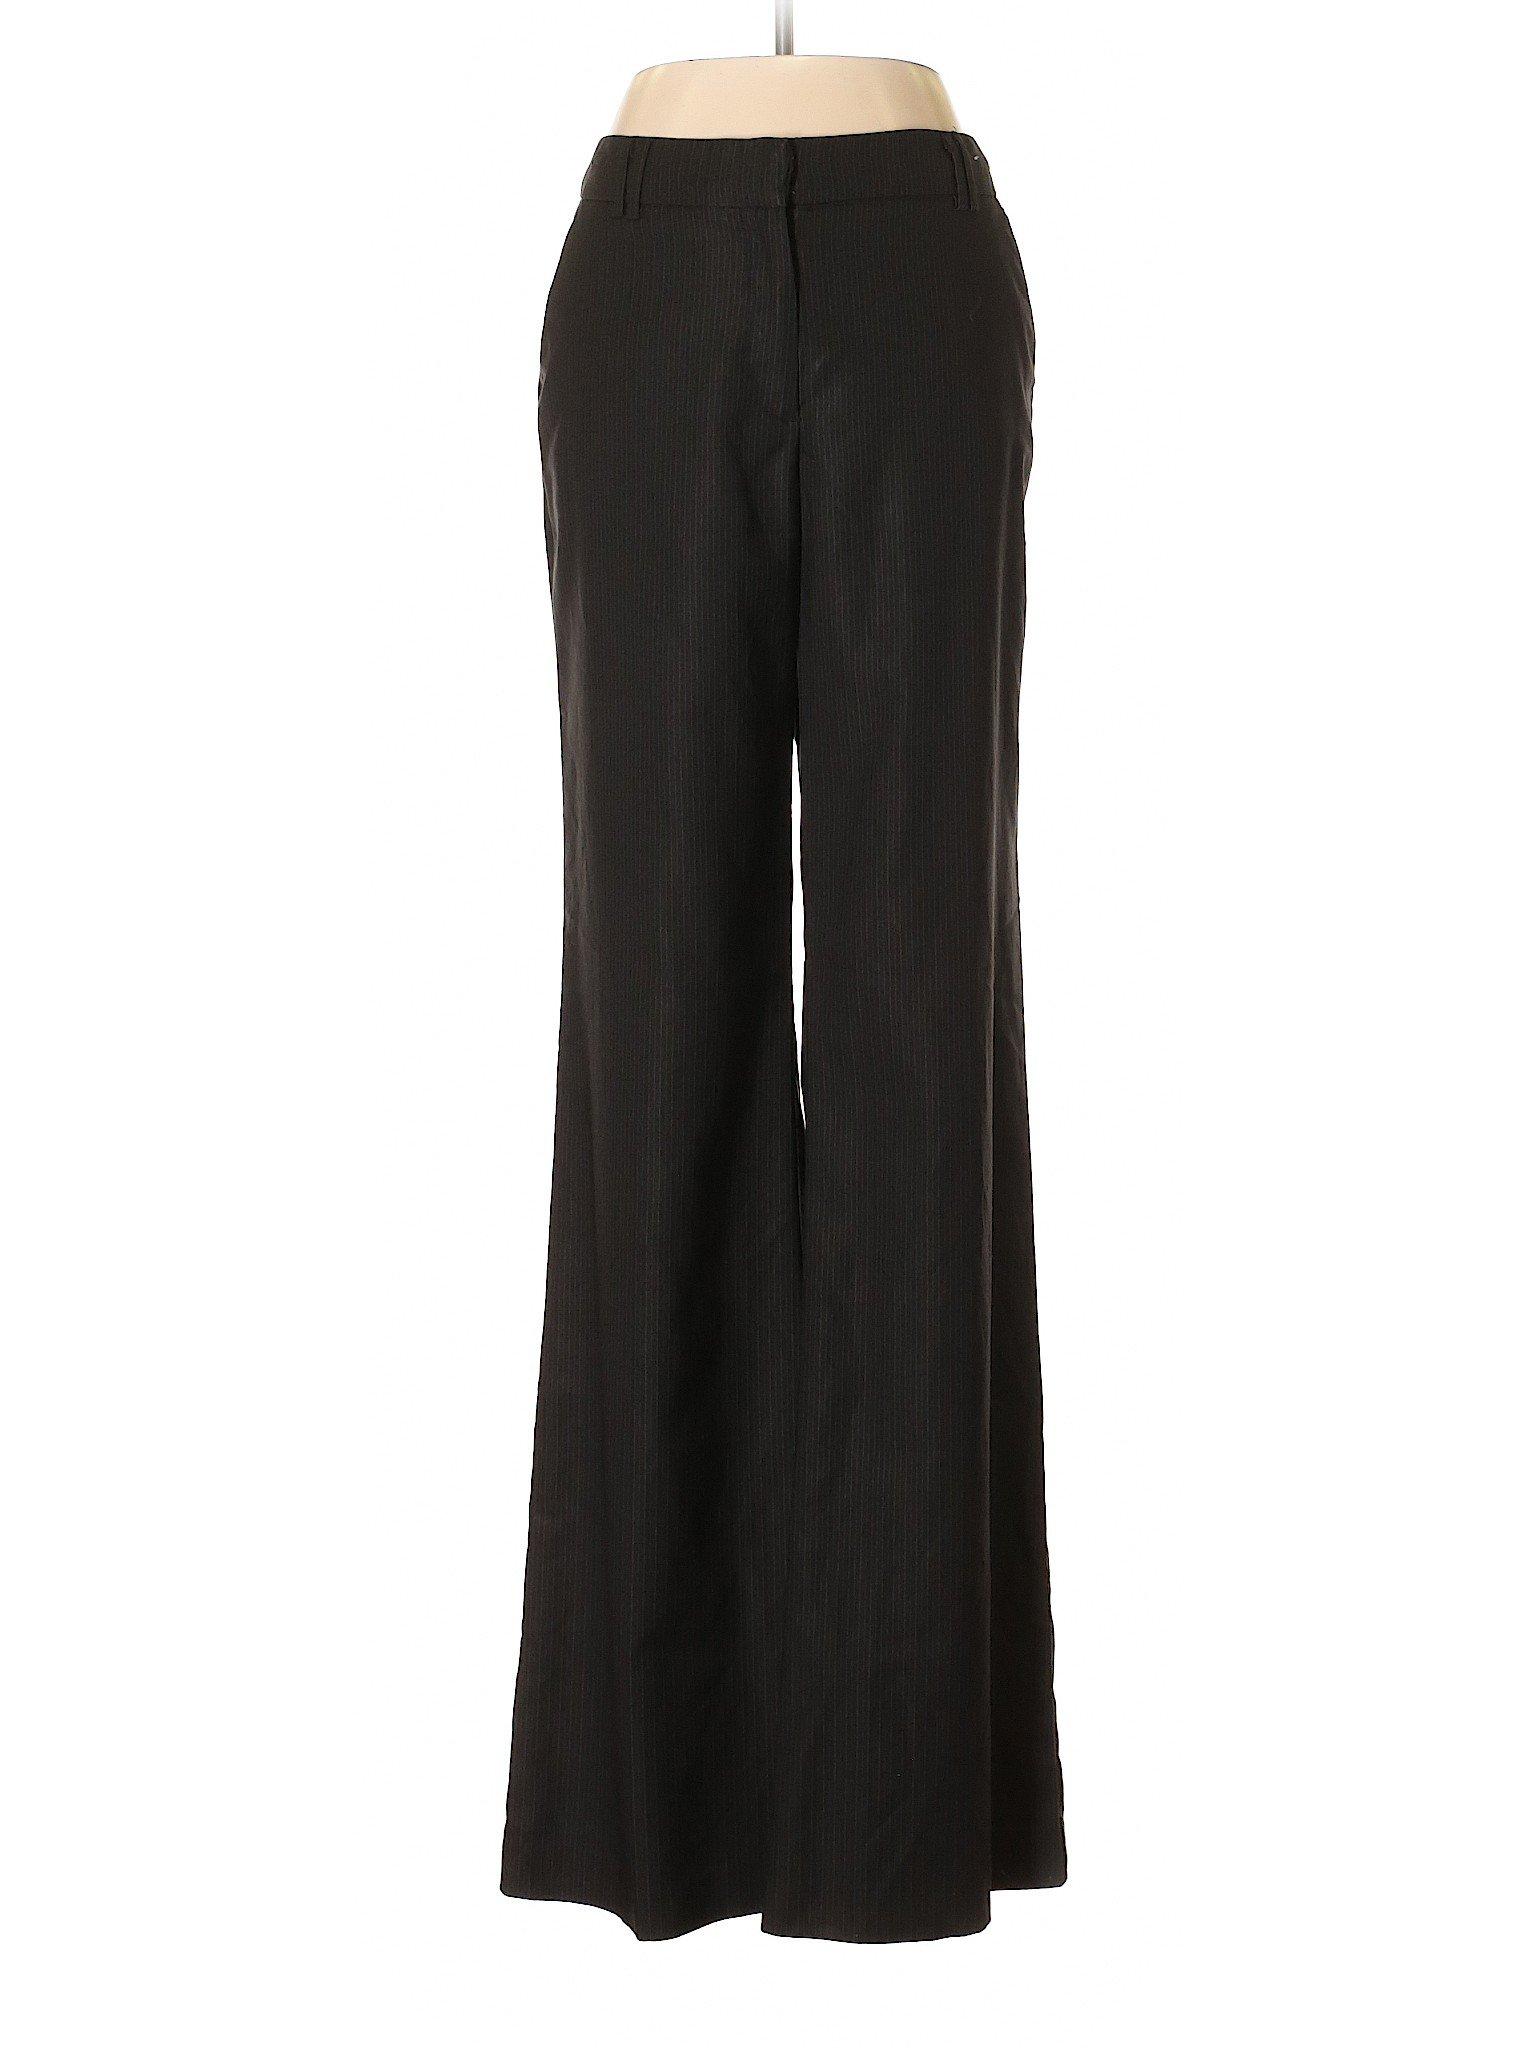 York amp; winter Pants Boutique Company New Dress EqB0WPzn